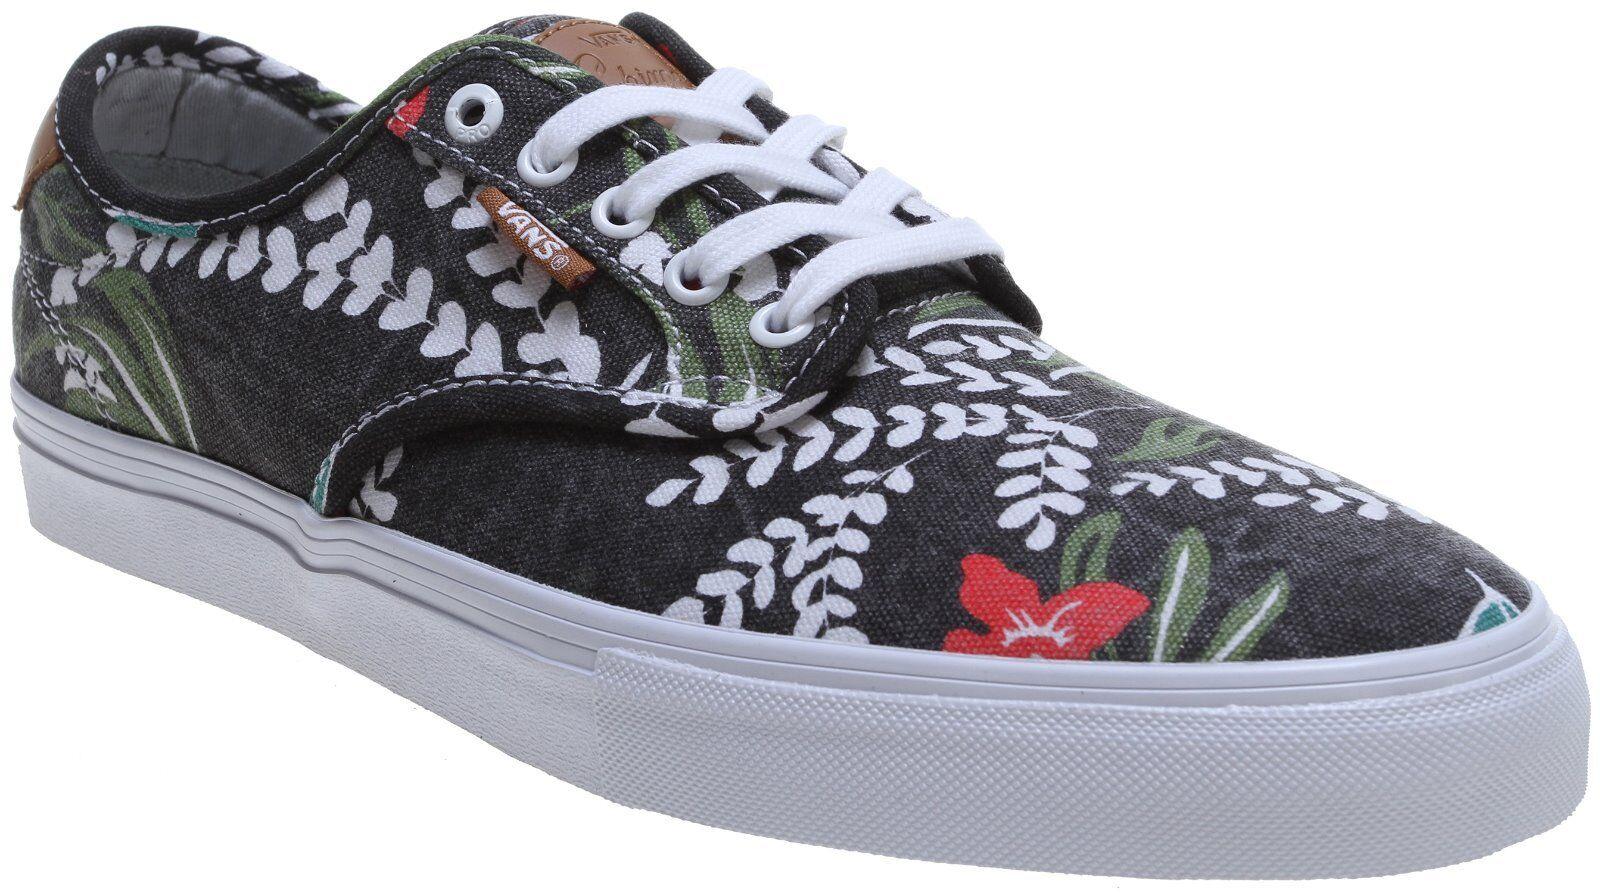 VANS CHIMA FERGUSON PRO (ALOHA) - Schuhe BLACK - MEN'S SKATE Schuhe - SIZE 9.5 11d252